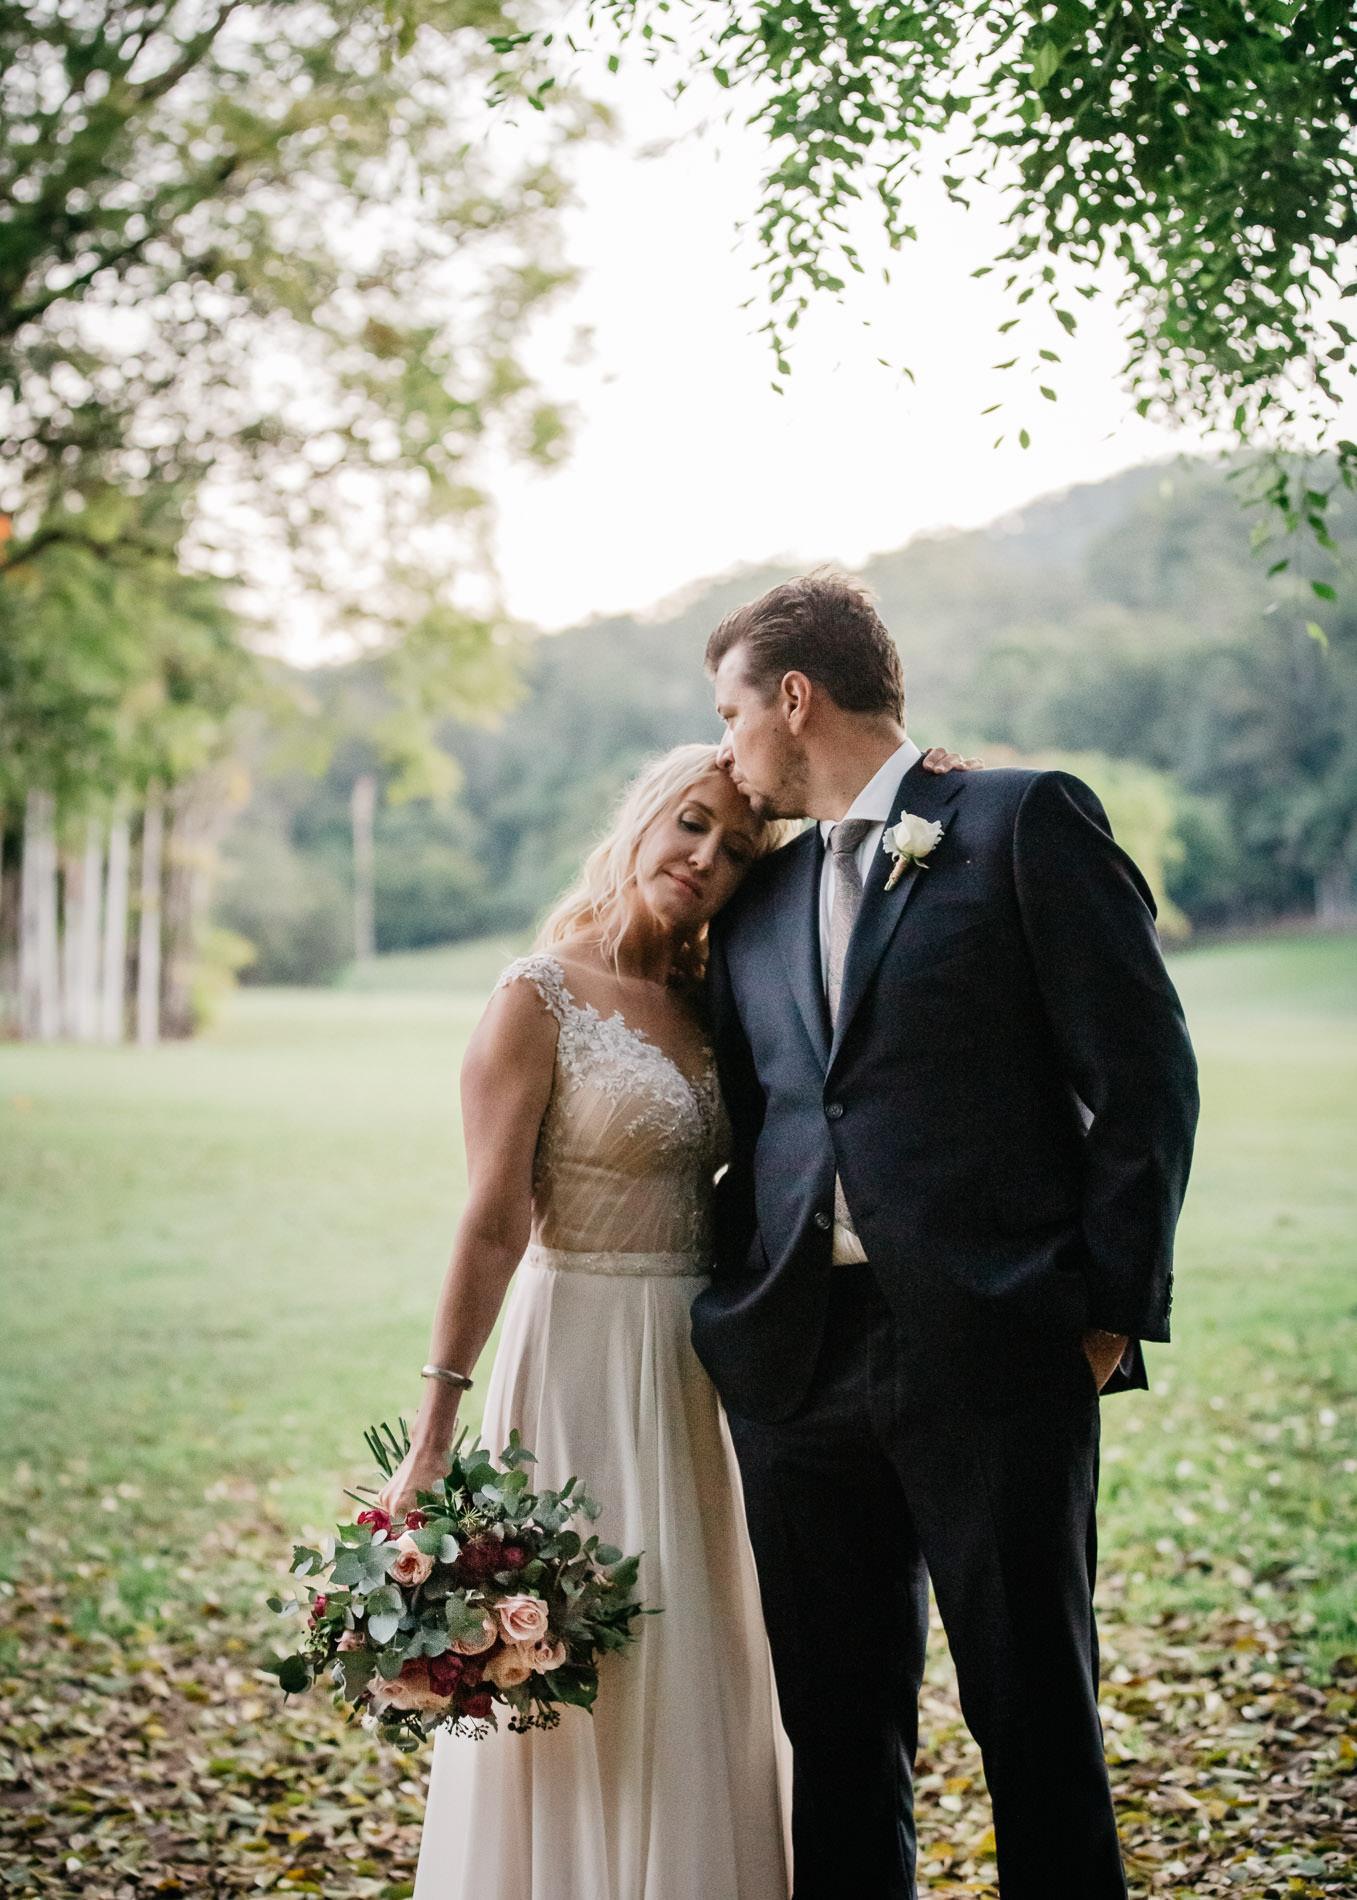 True North Photography_Boomerang Farm_Stacey and Isaac_Gold Coast Wedding_Barm Wedding_Hinterland Wedding-173.jpg